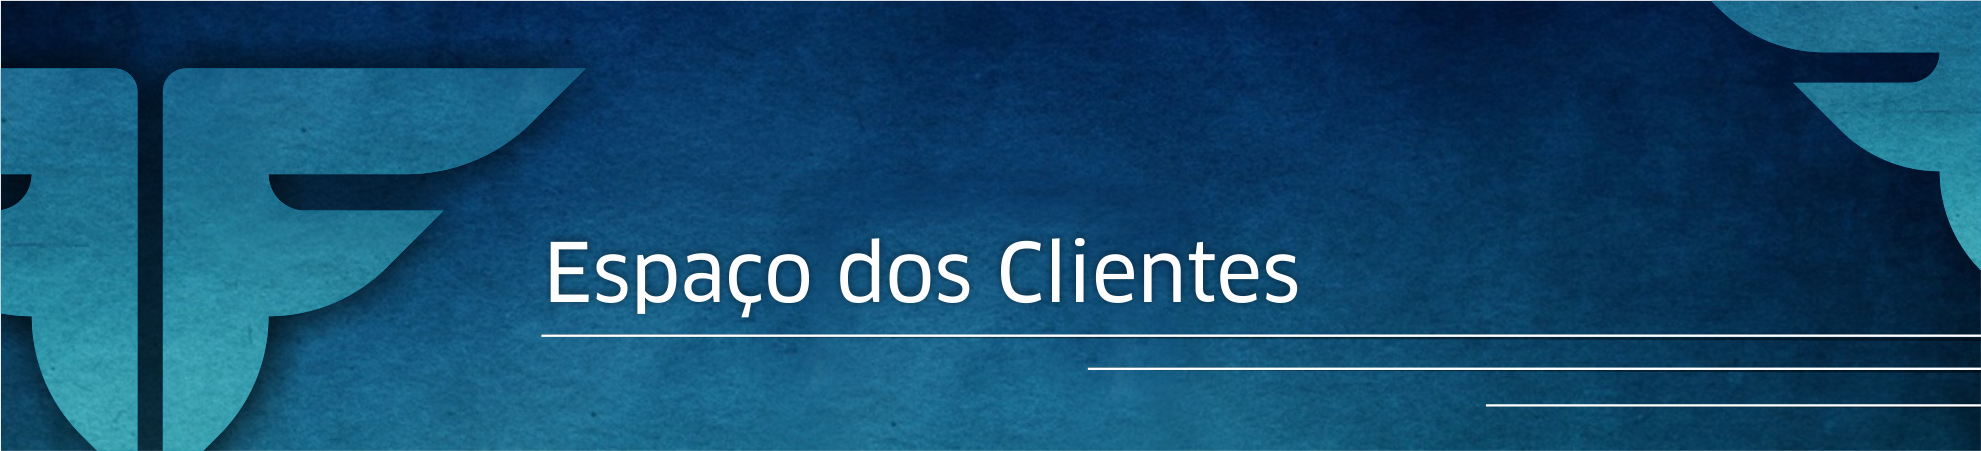 banner_pagina_clientes